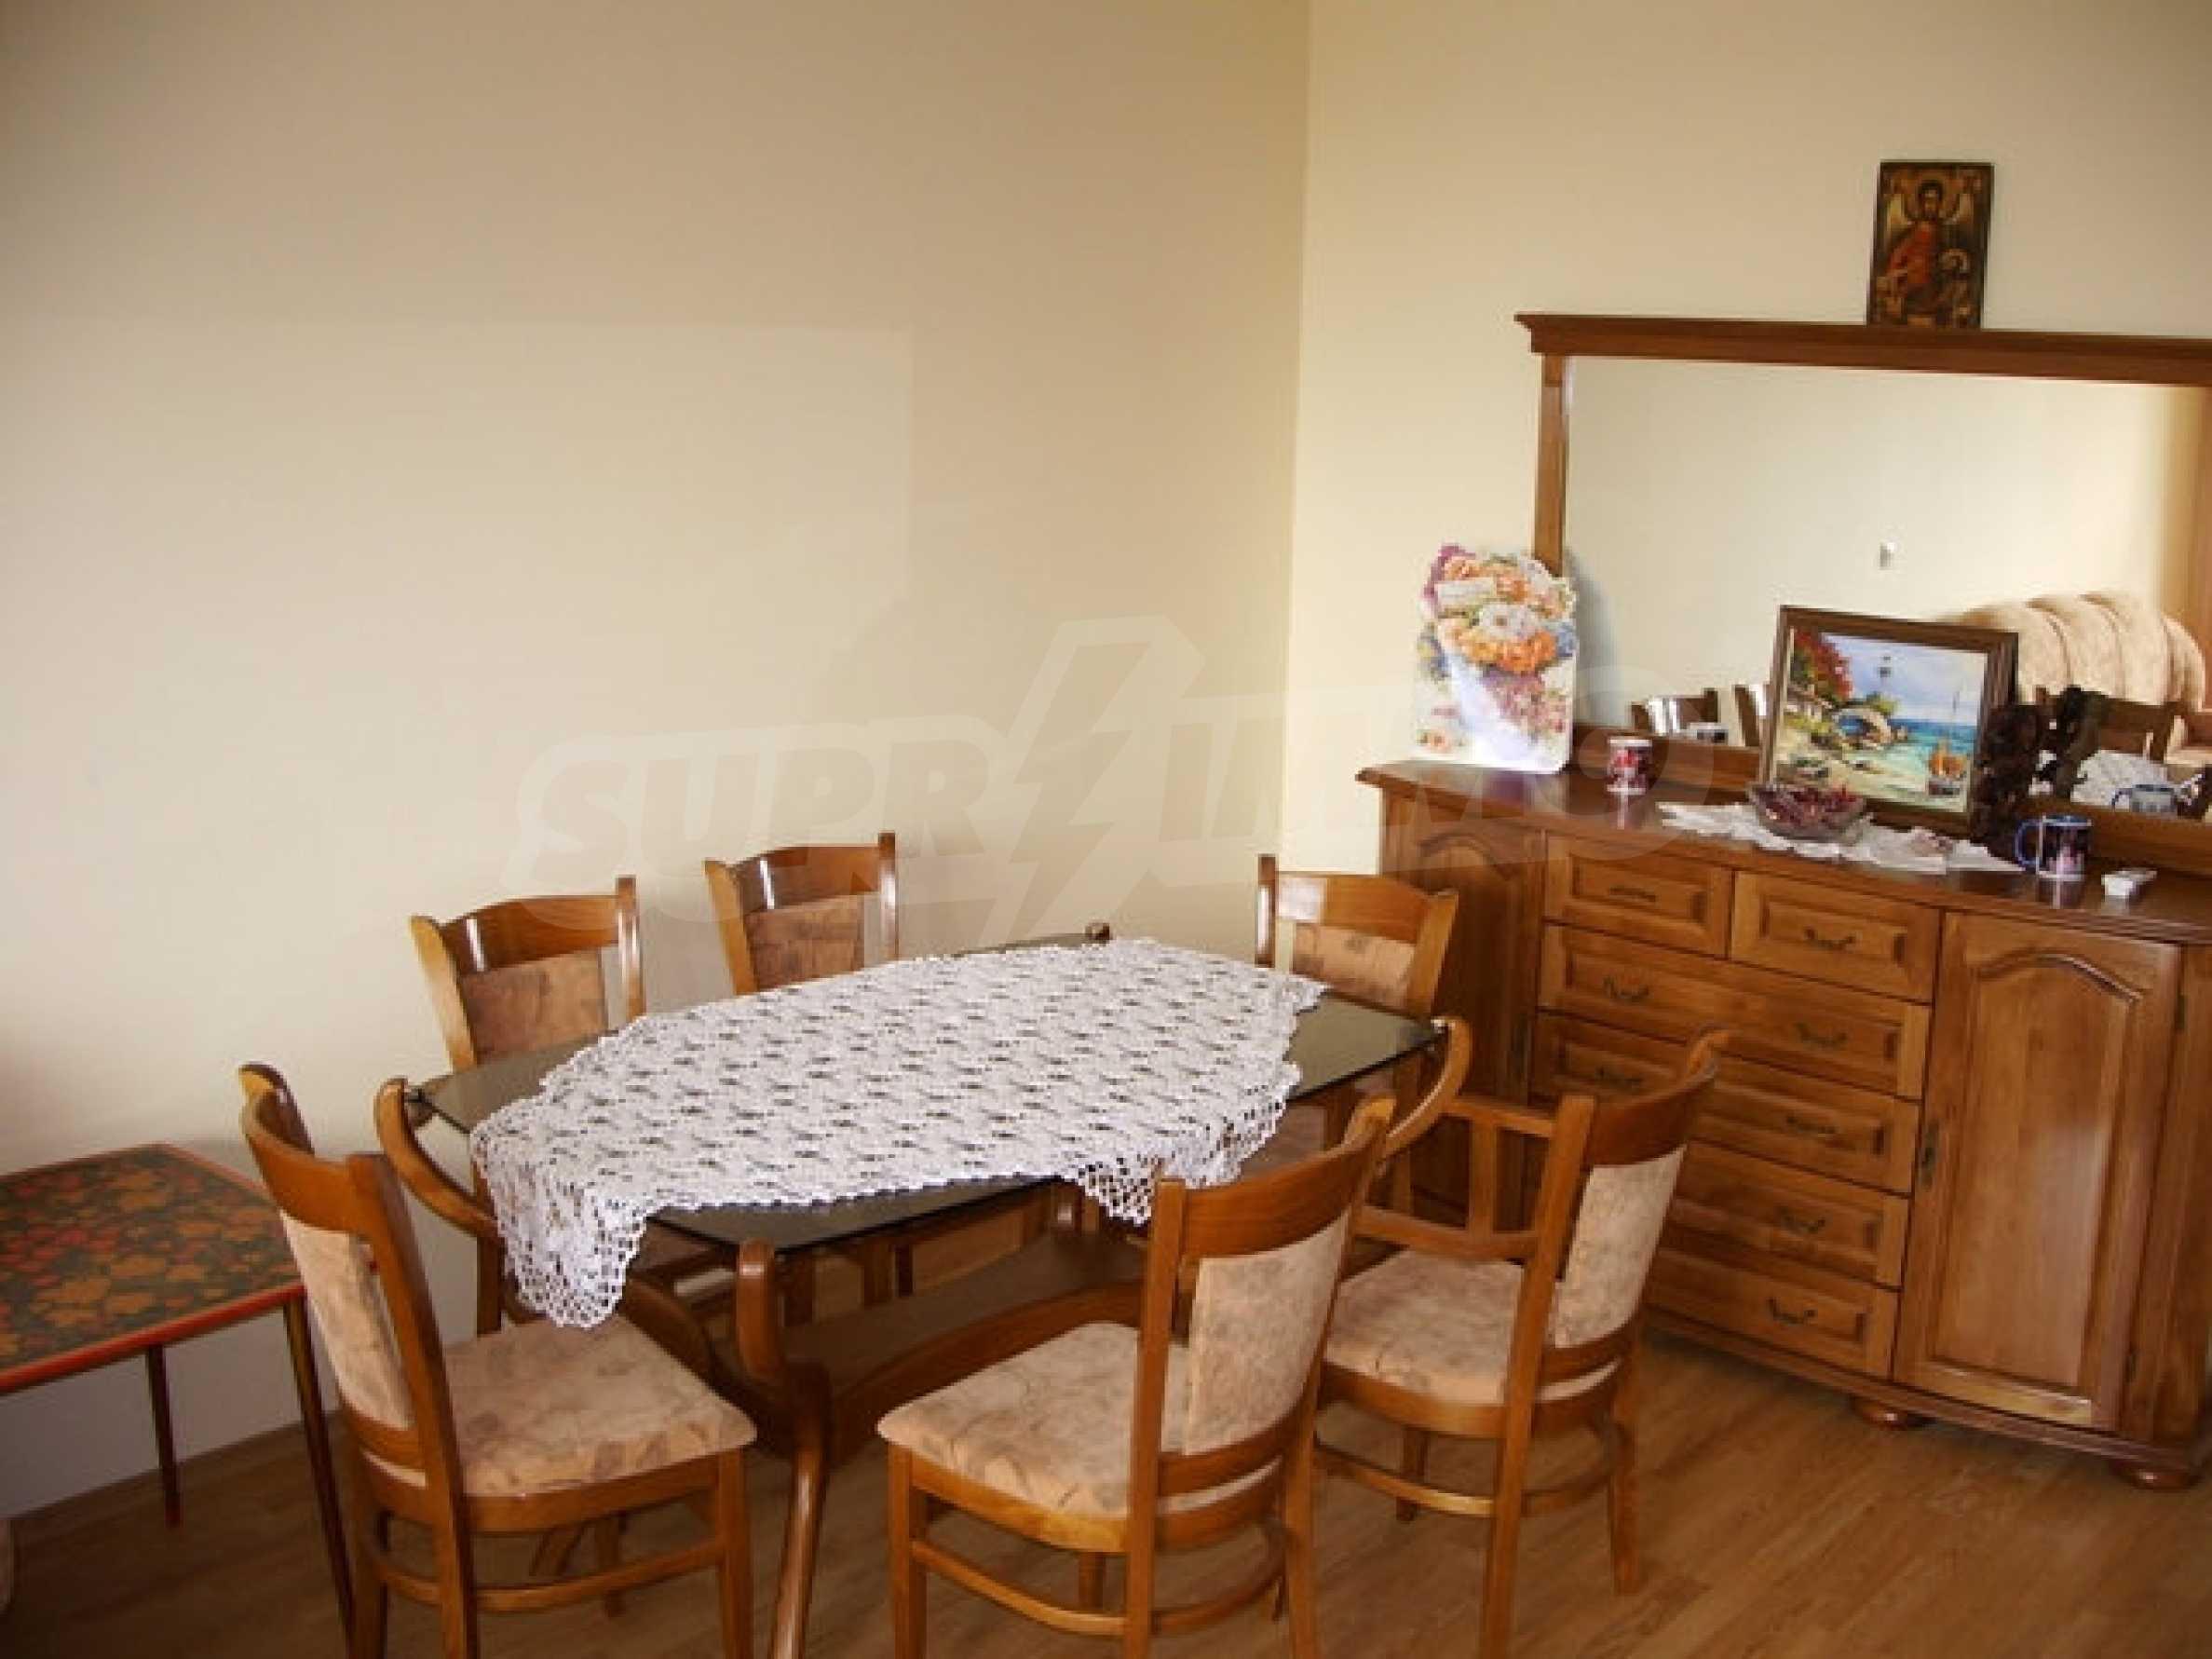 Квартира Евксиноград в Варне 2